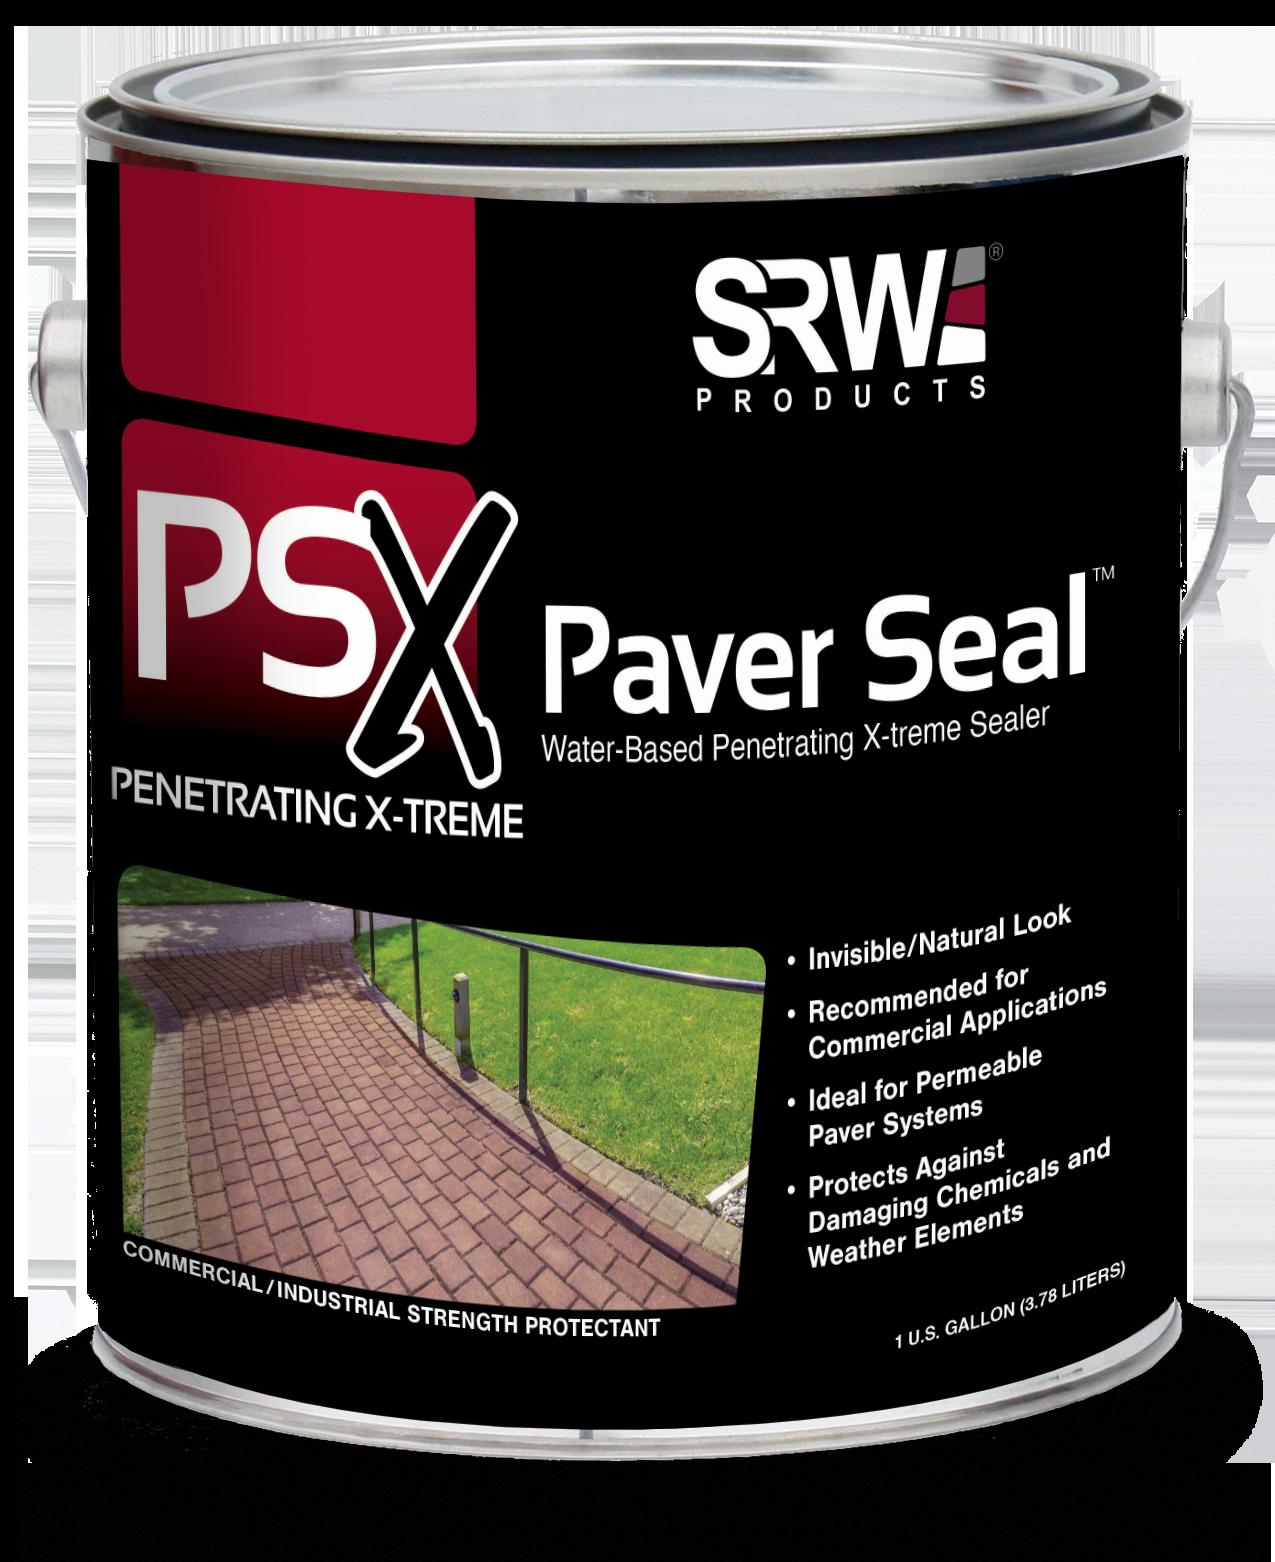 PSX_1Gallon_Paver Seal_2019_RGB_SHADOW